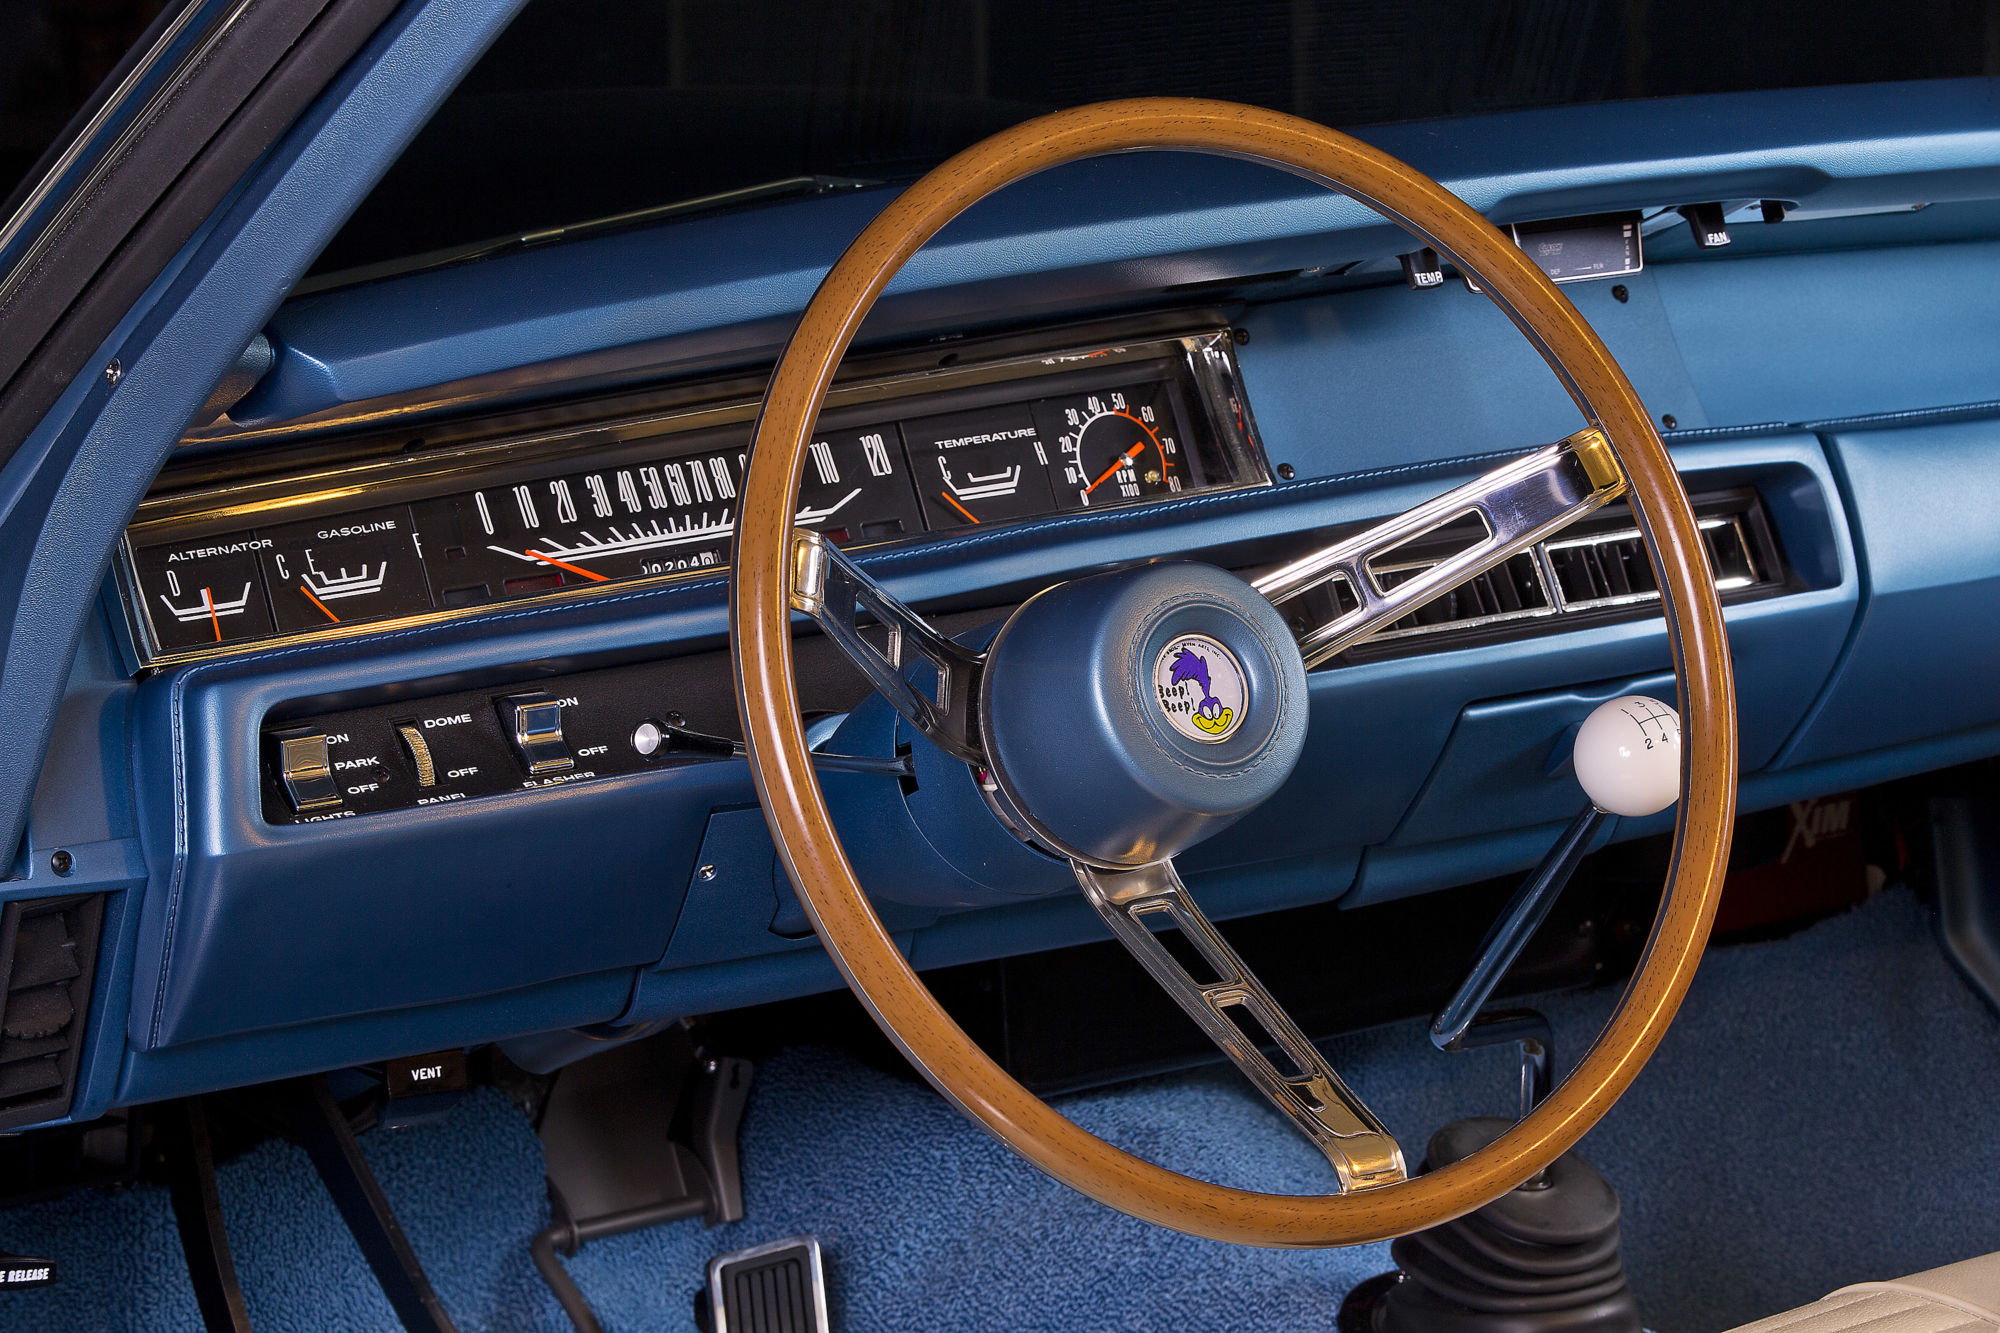 1969 Plymouth Road Runner A12 Resto Mod American Muscle Car 69 Roadrunner Alternator Wiring Diagram